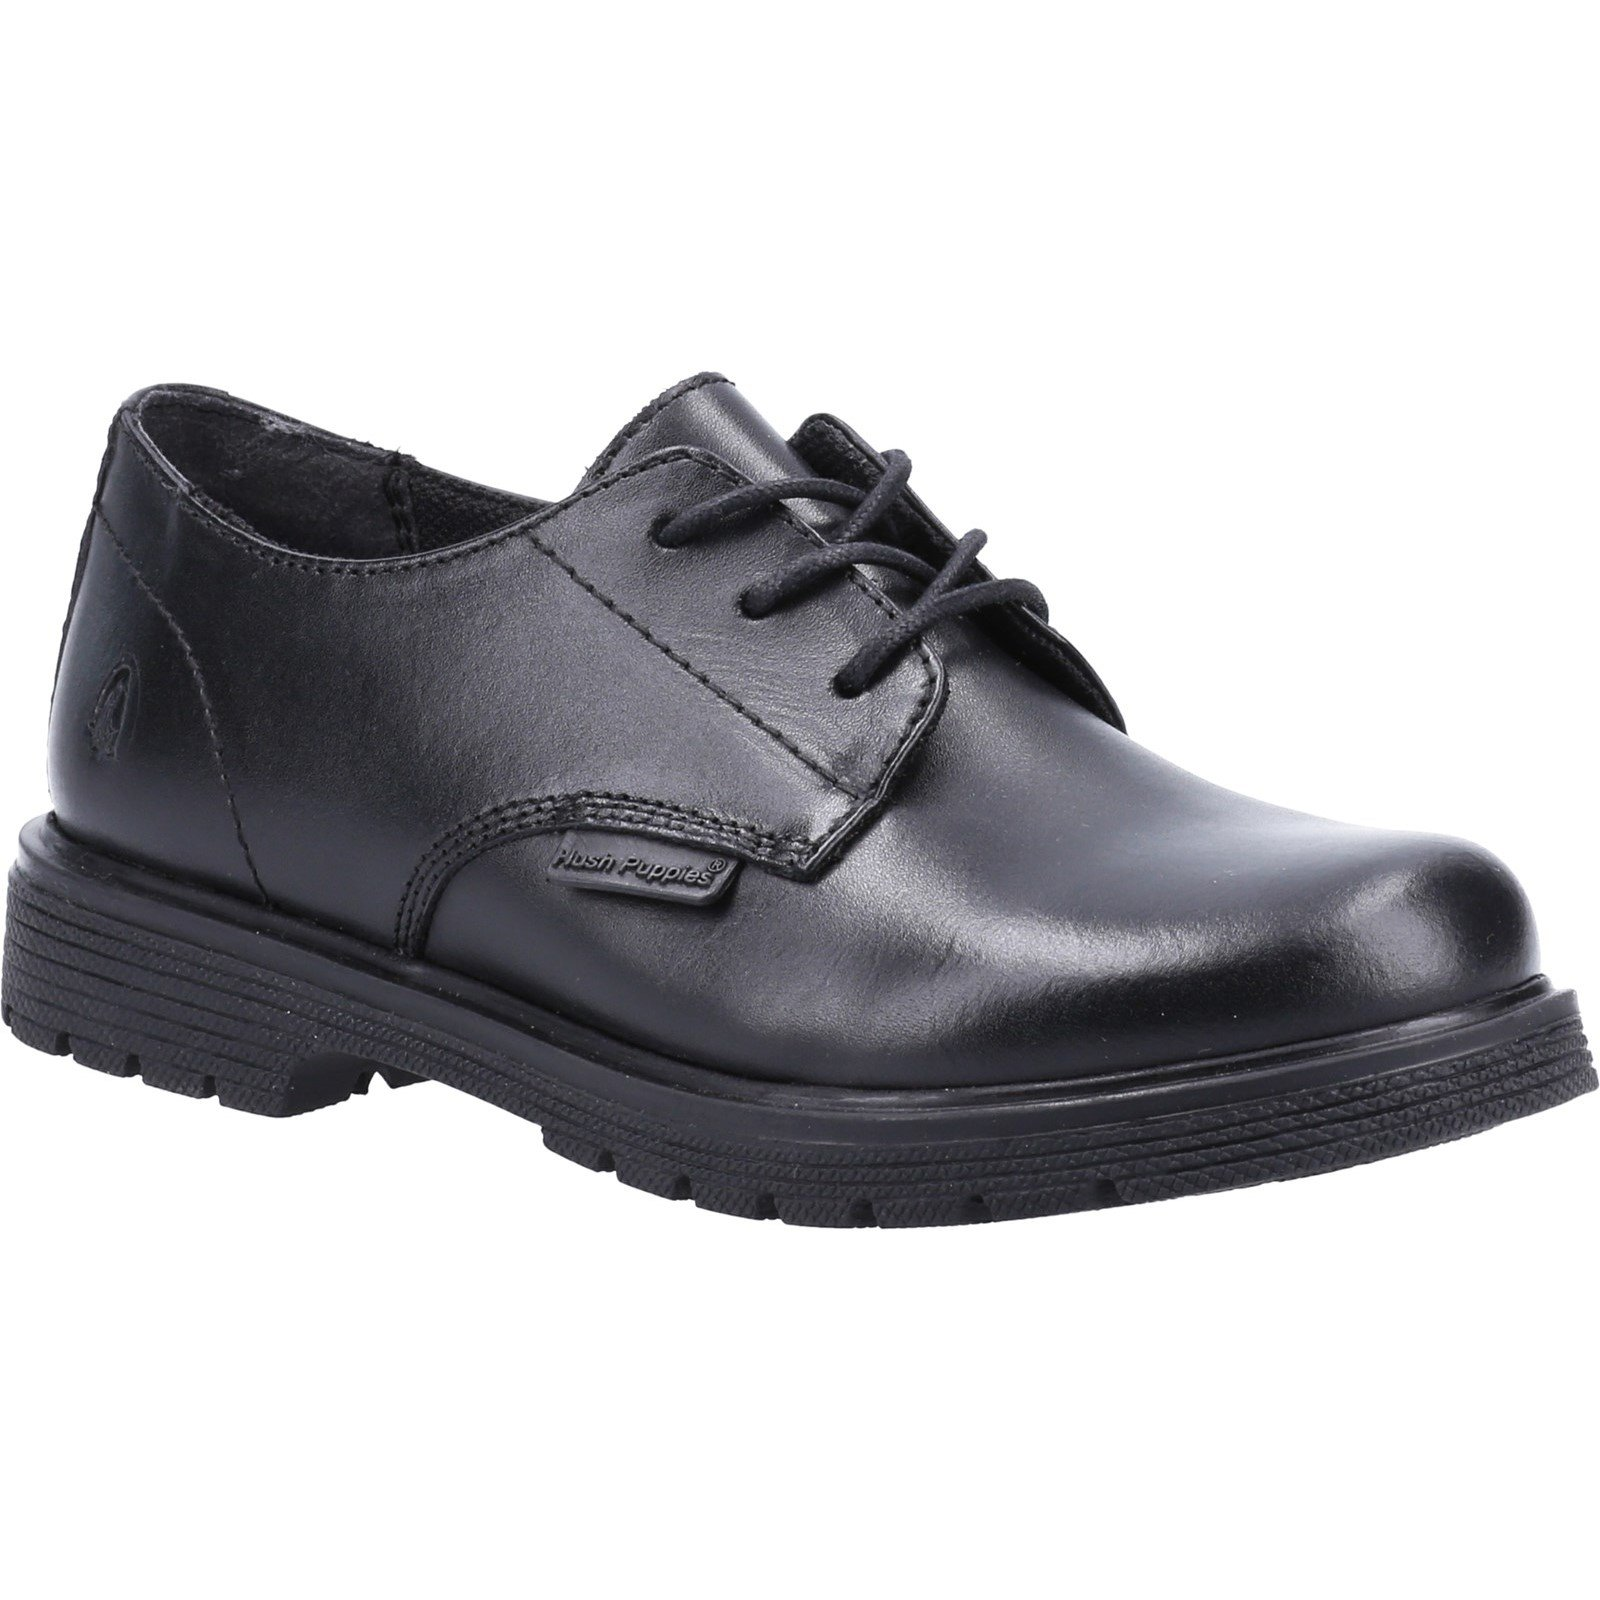 Hush Puppies Kid's Remi Junior School Derby Shoes Black 32612 - Black 13